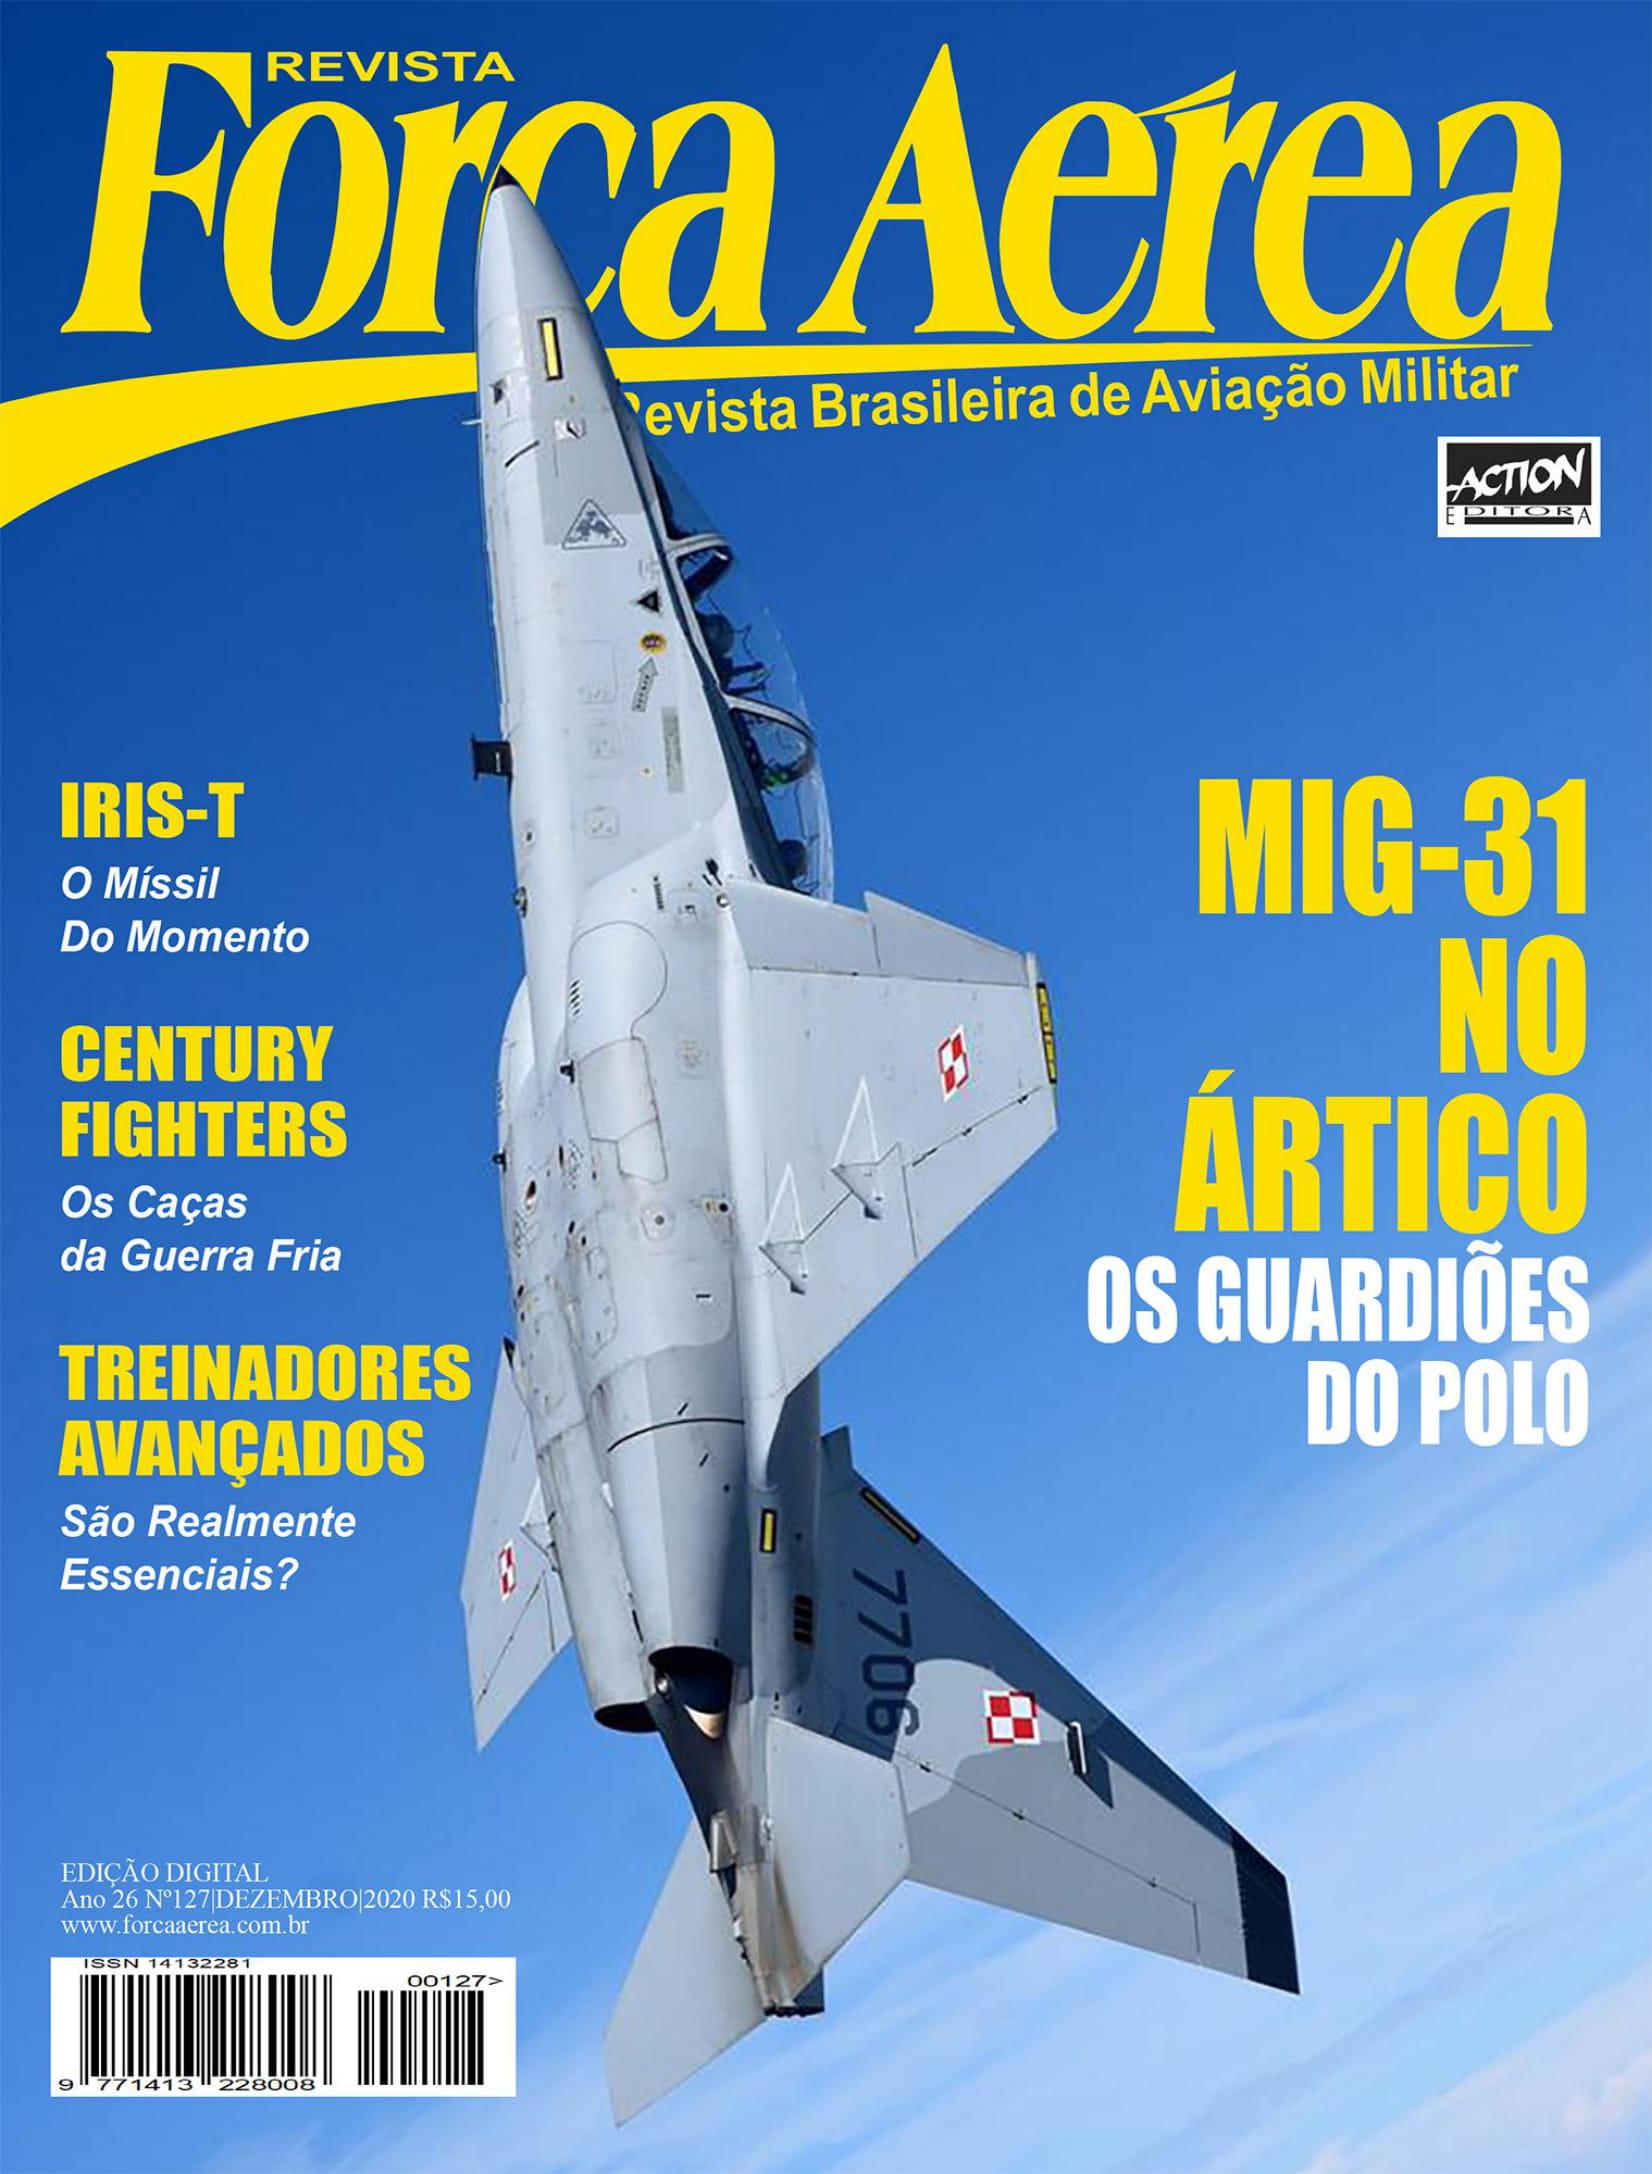 Revista Forca Aerea (Brazil)_Baccarat 2020 (1)-1